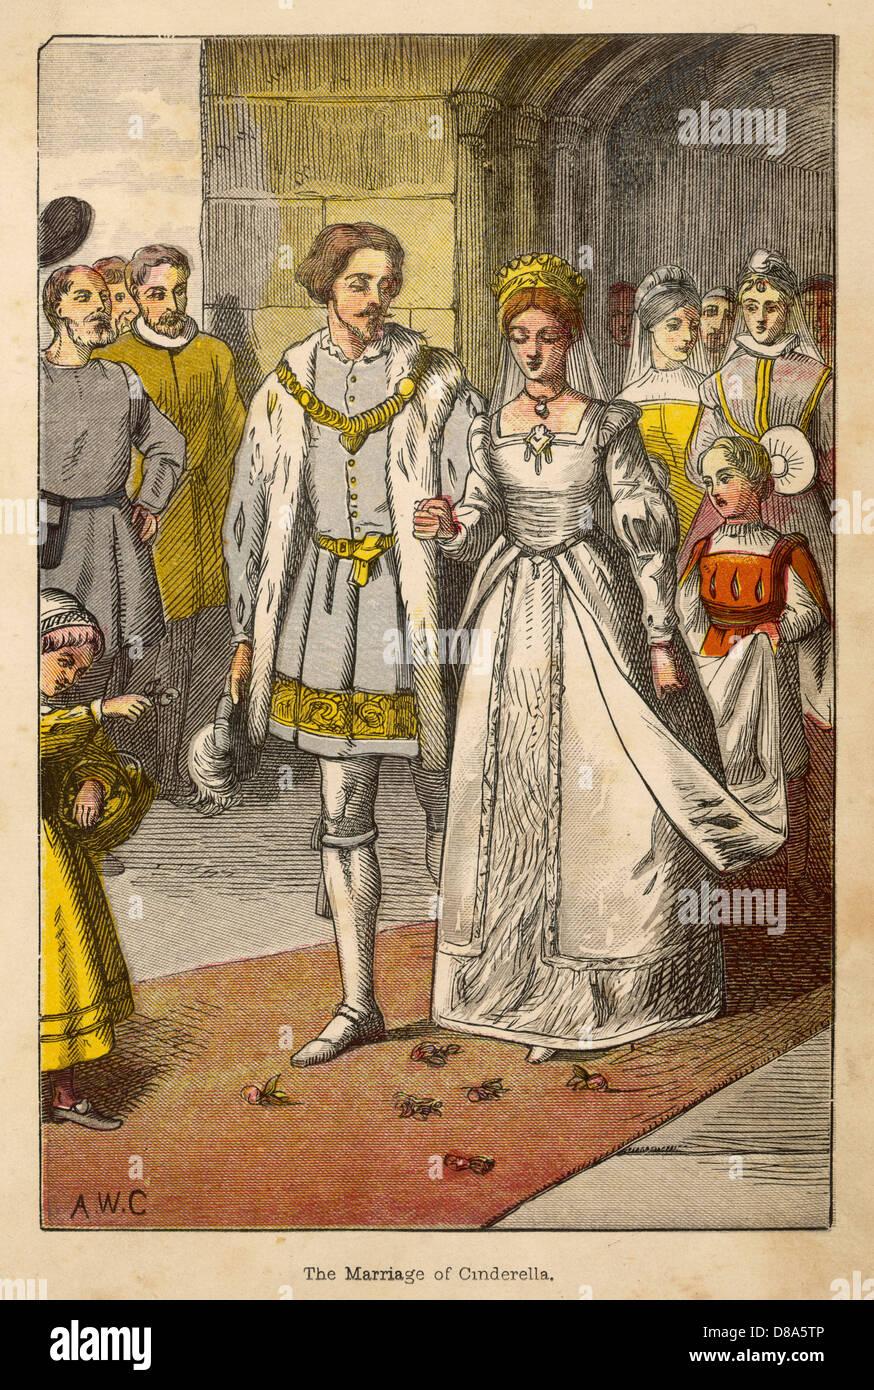 Fairytale Wedding 1867 - Stock Image